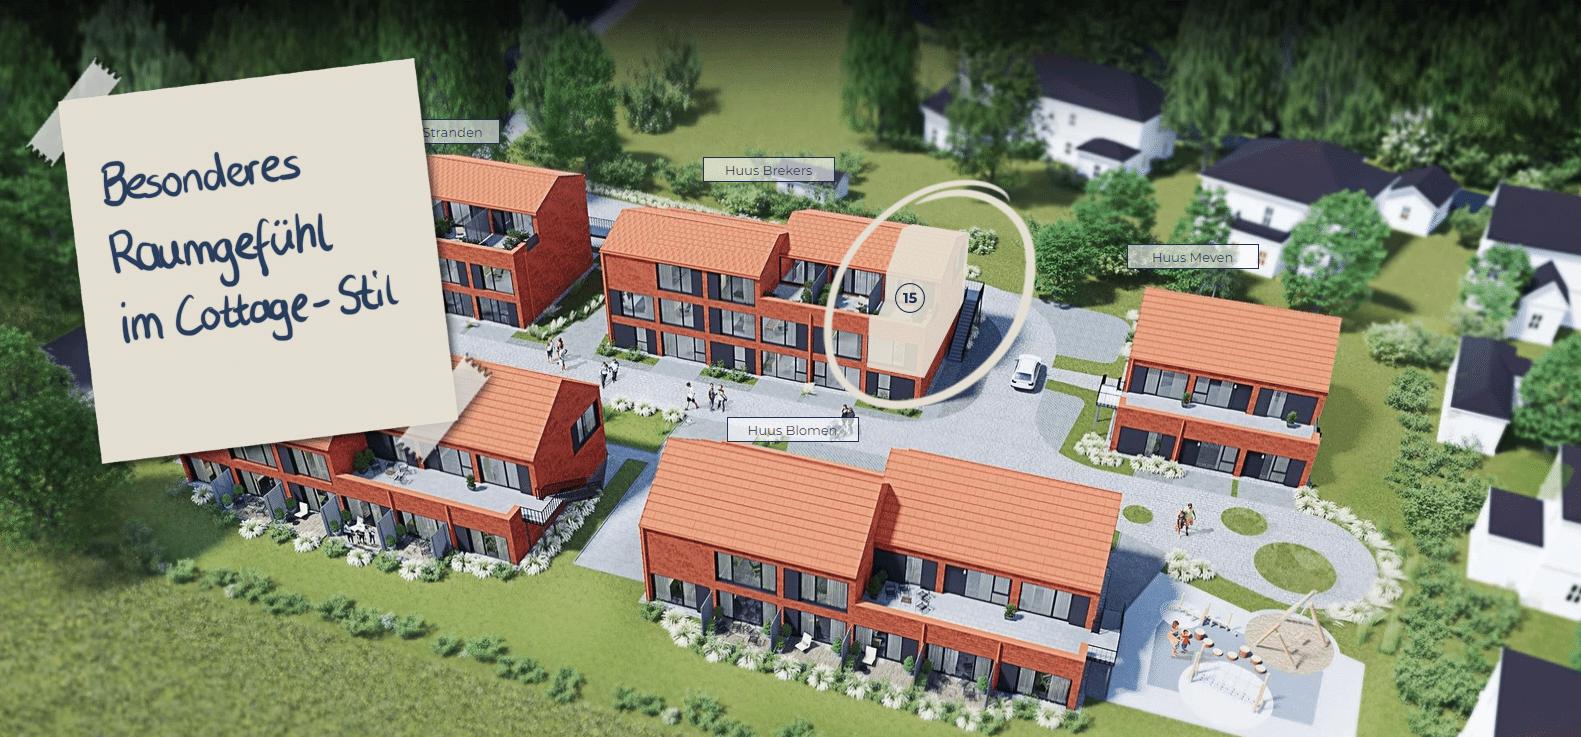 15_De ole School - Ostseeurlaub Ferienapartments Hohwacht Nähe Heiligenhafen Lütjenburg Kieler Bucht